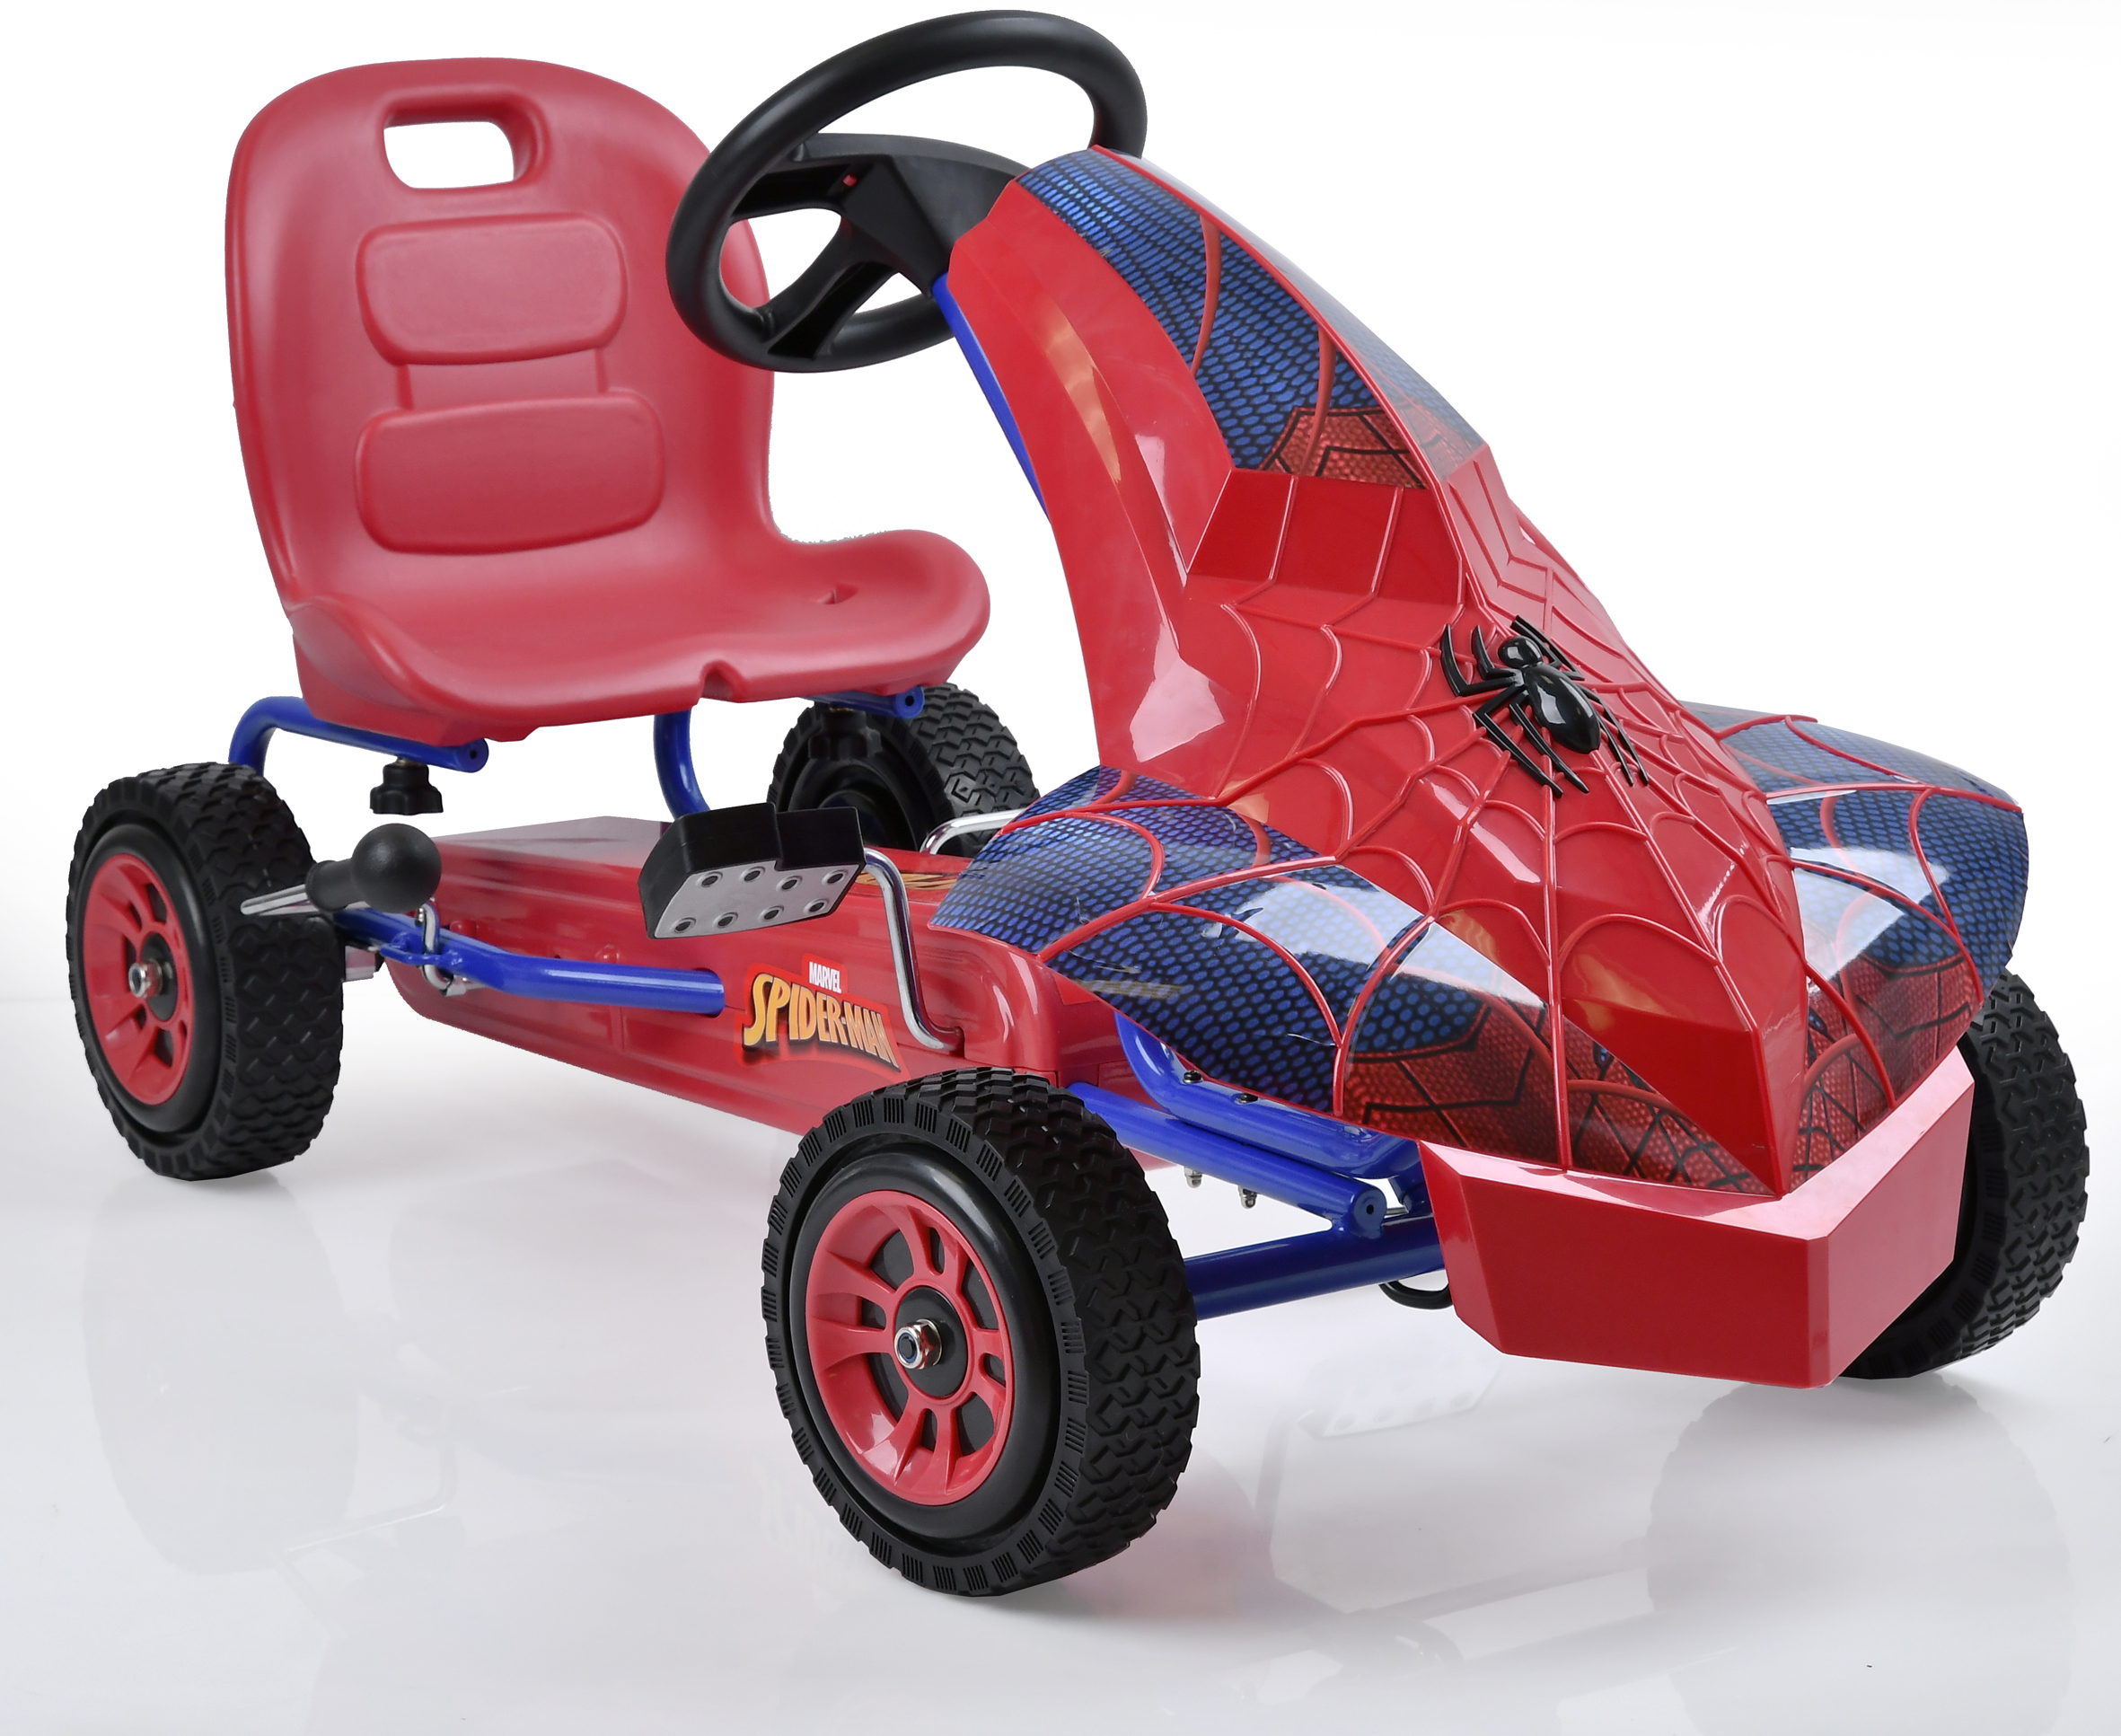 Marvel Spider-Man Pedal Go Kart by Hauck